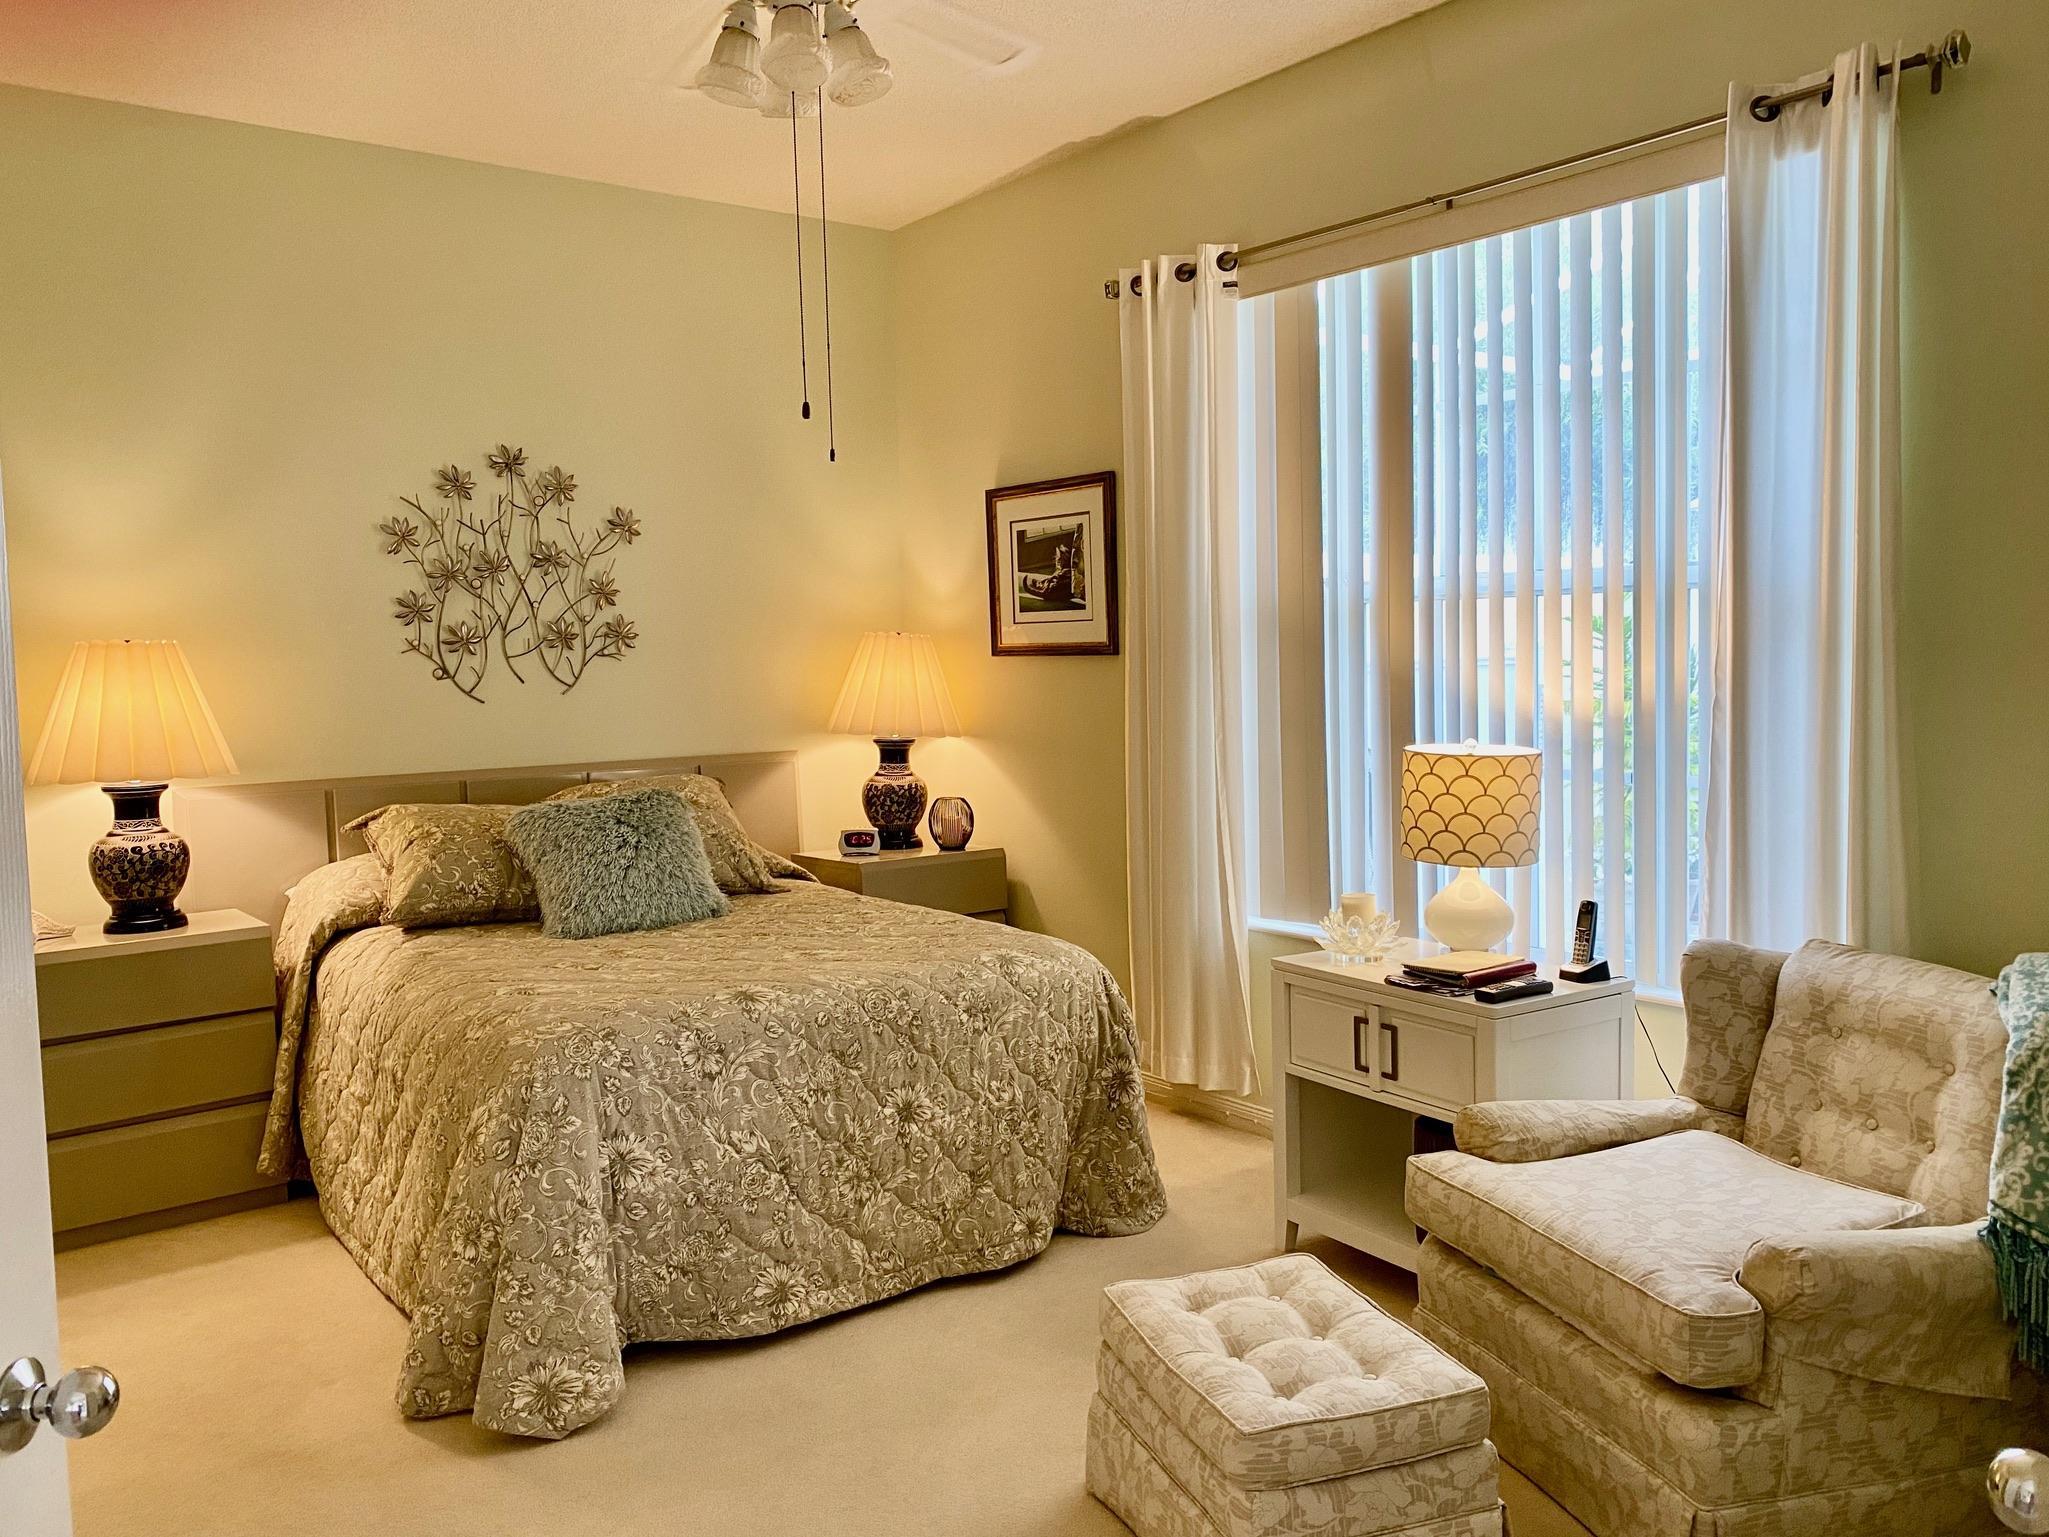 344 NW Bentley Circle - 34986 - FL - Saint Lucie West